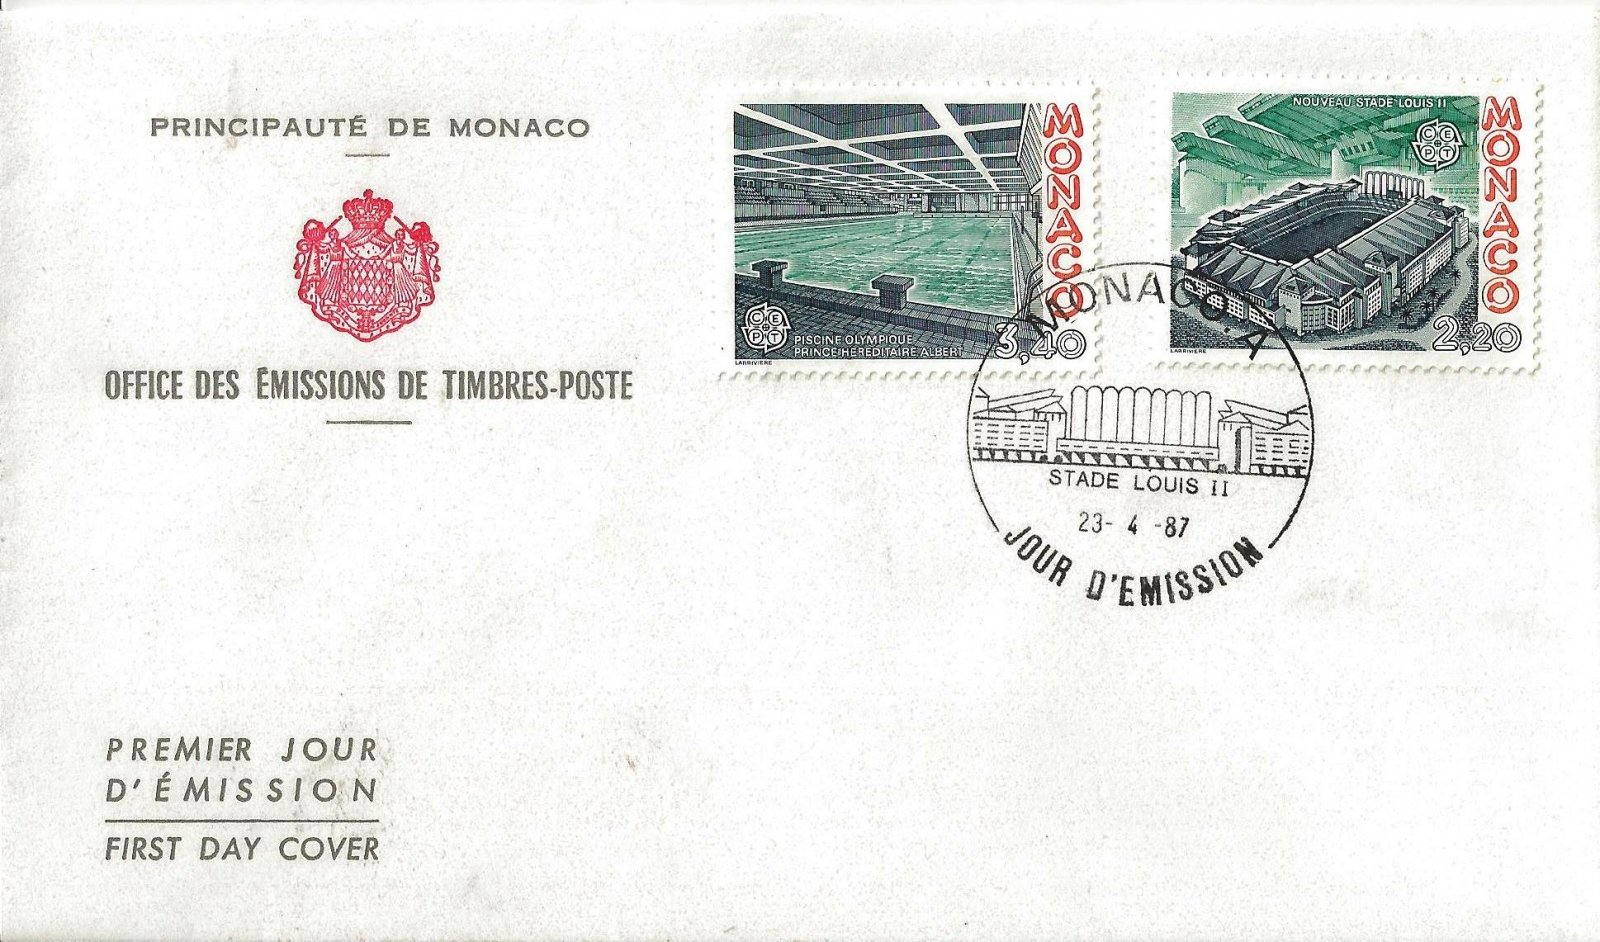 1987 STADE LOUIS II MONACO